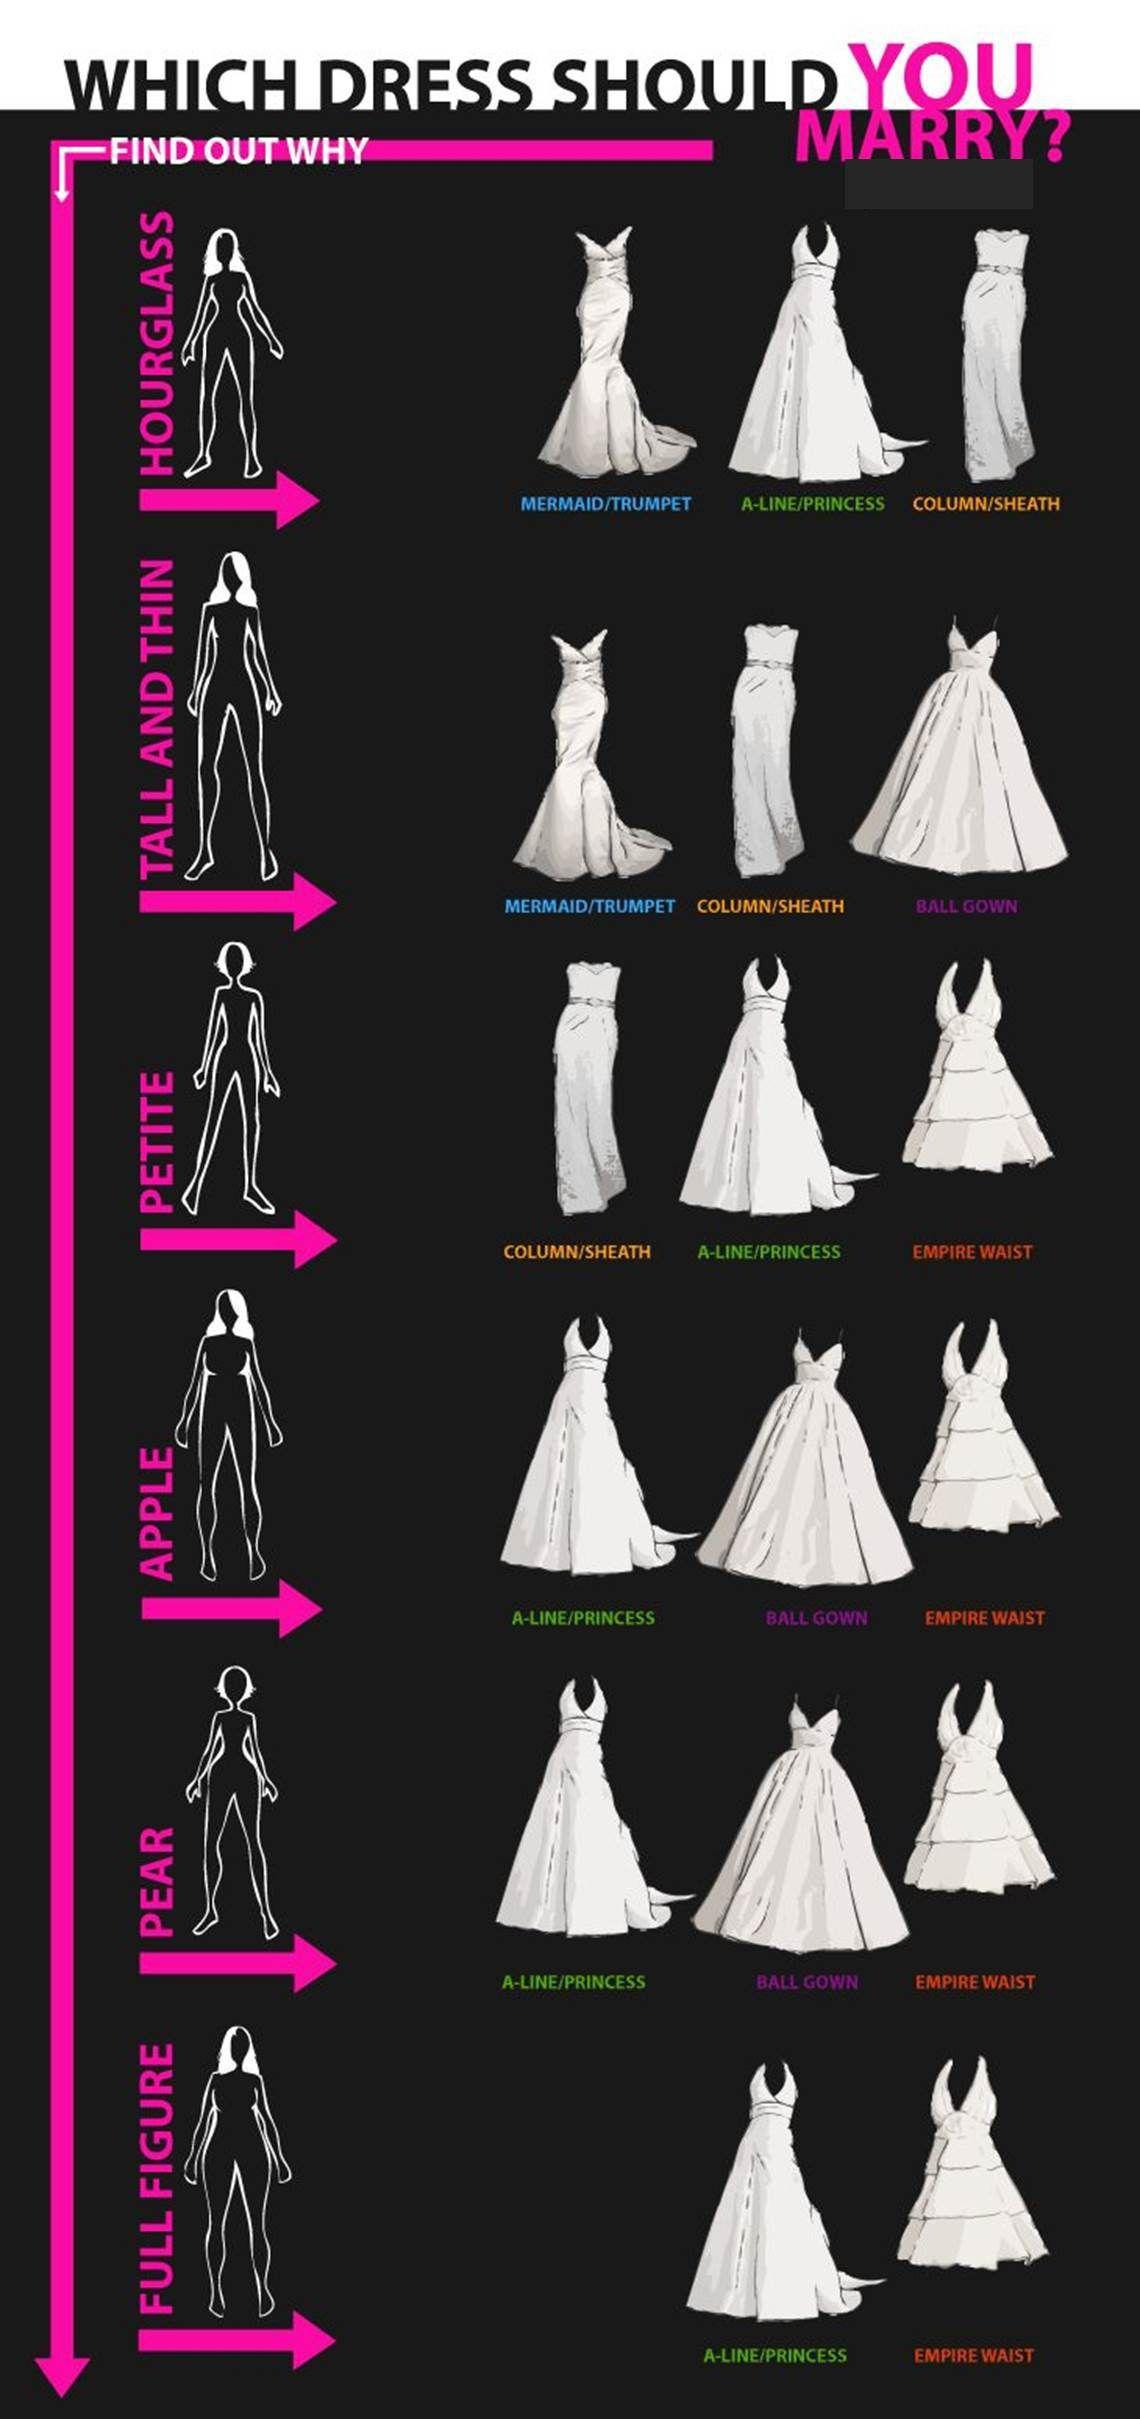 Wedding dress for body type  Weddingdresstosuitbodyshapeoompheliciouswordpress